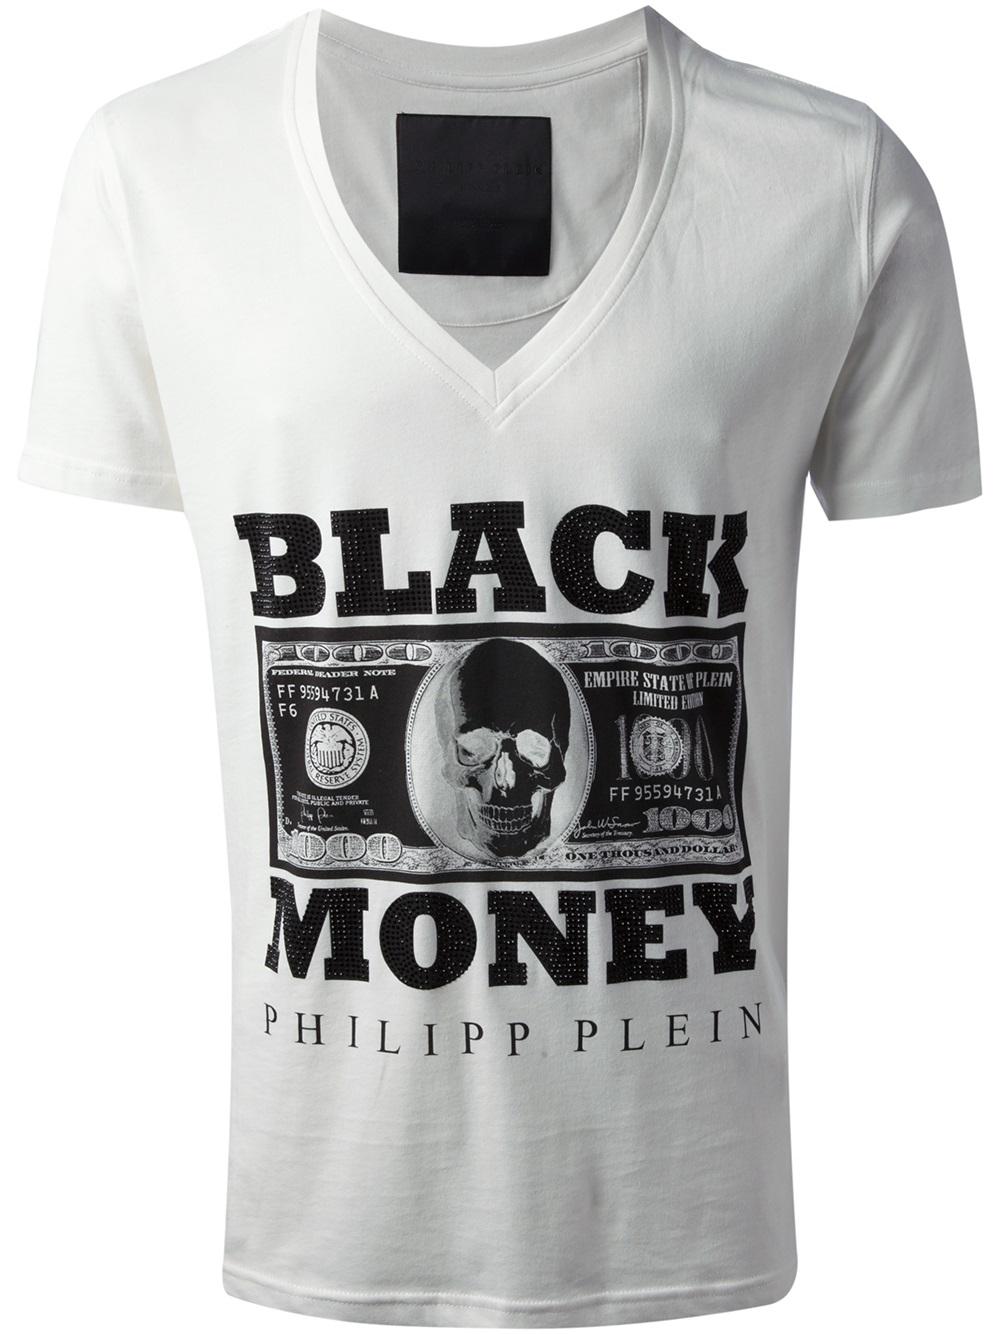 Lyst - Philipp Plein Black Money T-shirt in White for Men c08a0483898f